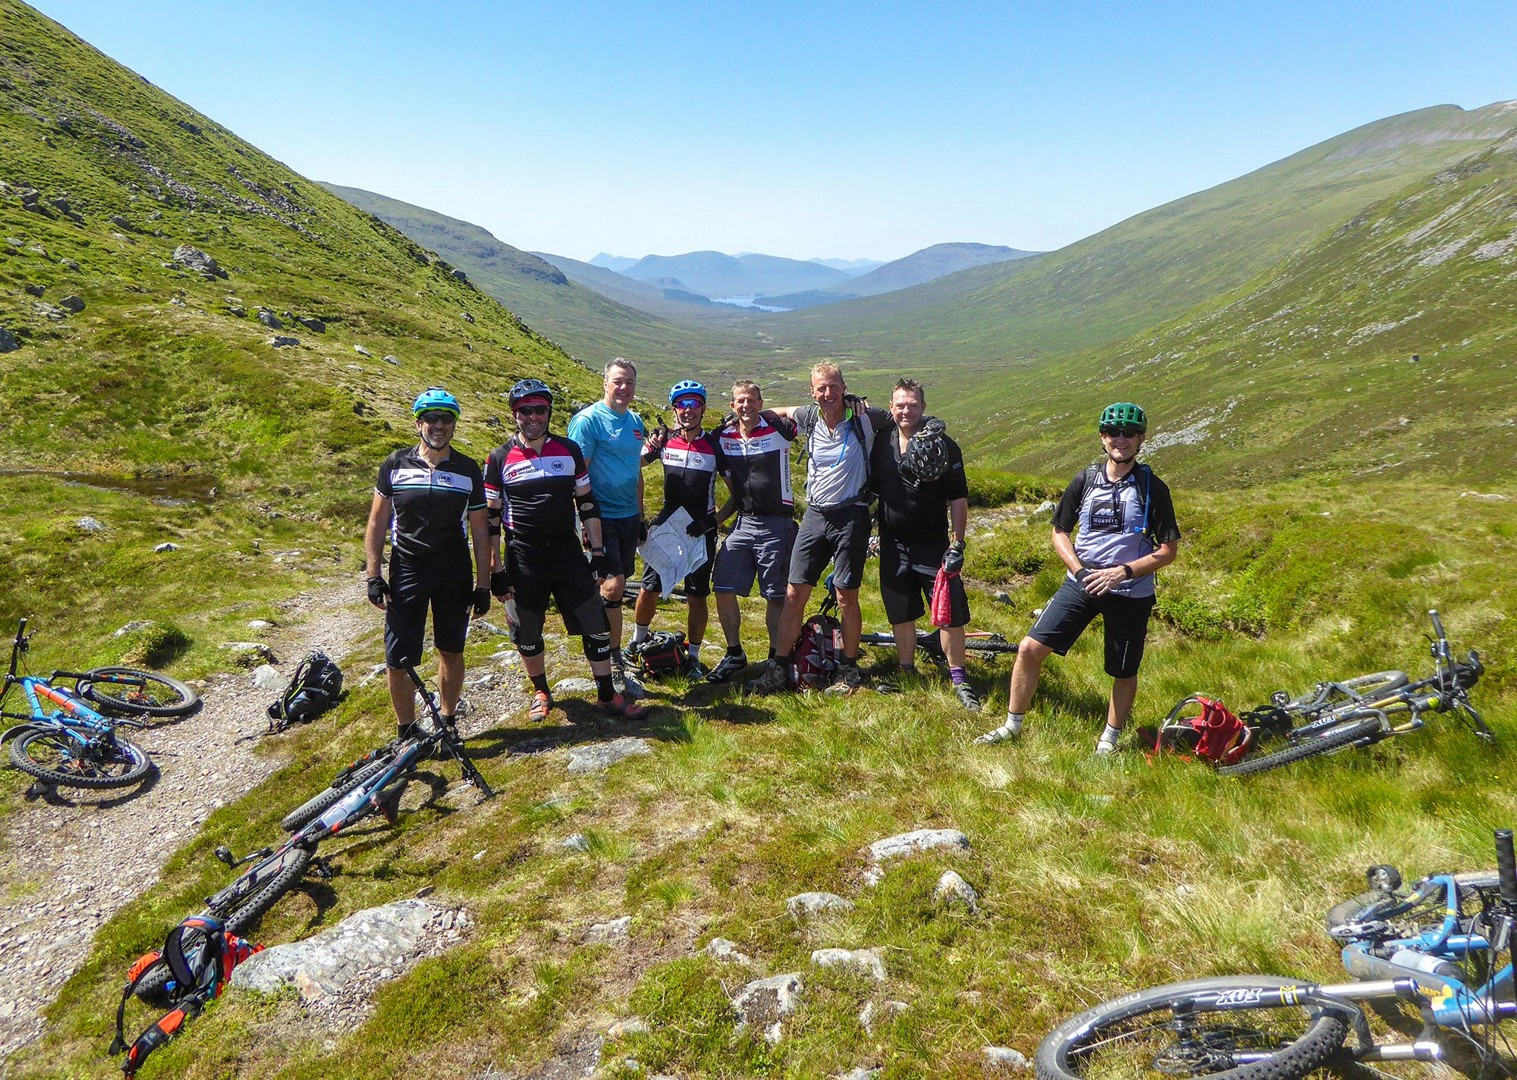 P1010205.jpg - Scotland - Celtic Crossing - Guided Mountain Bike Holiday - Mountain Biking